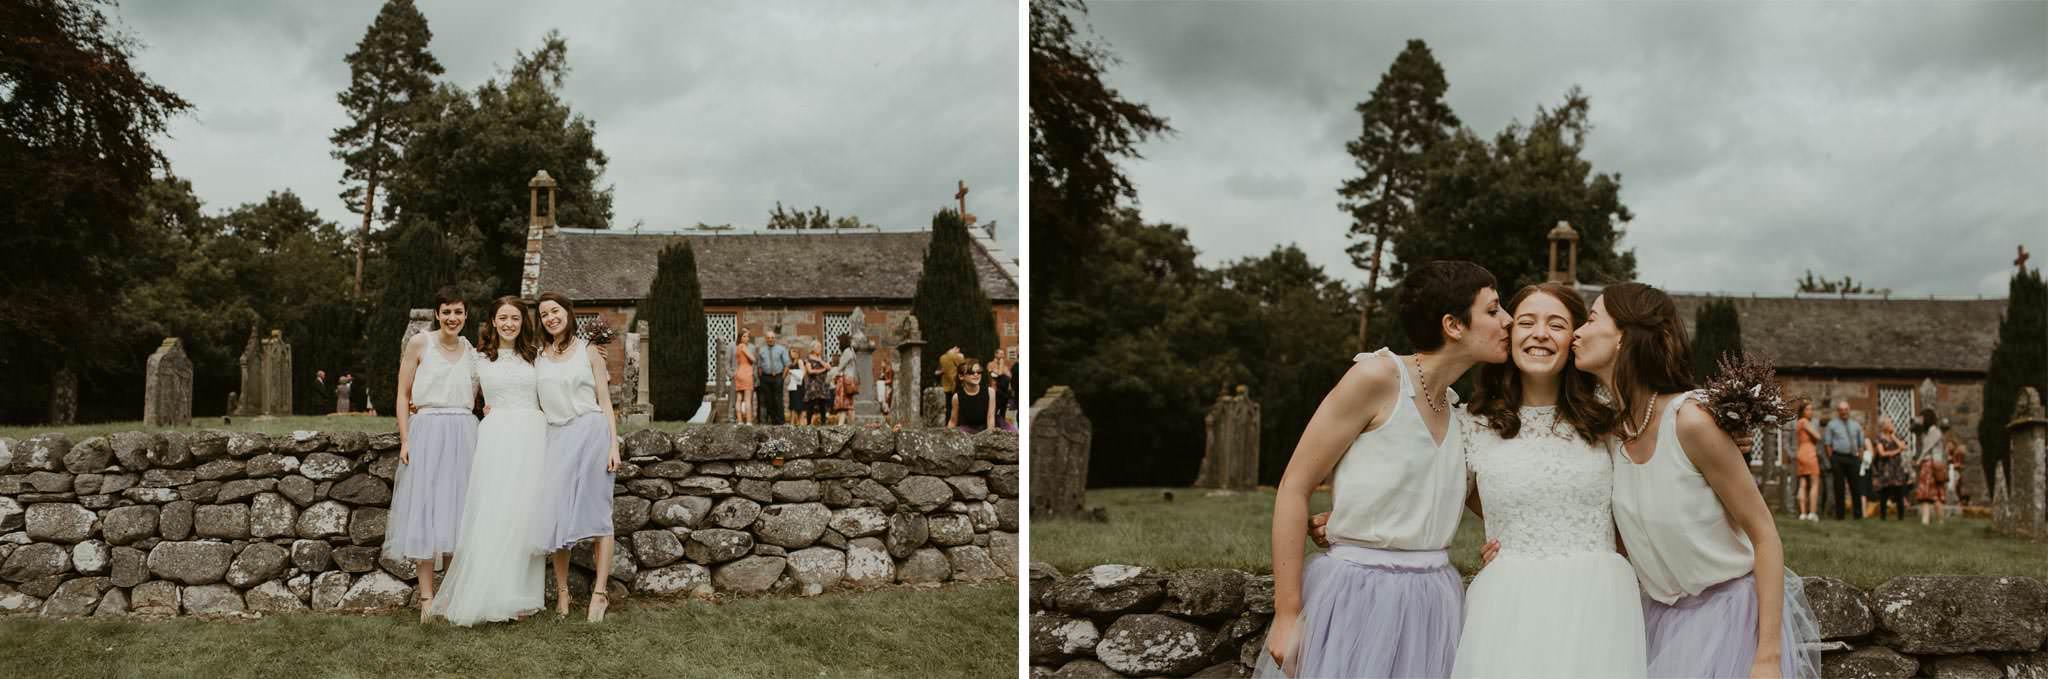 scotland-wedding-photographer-134